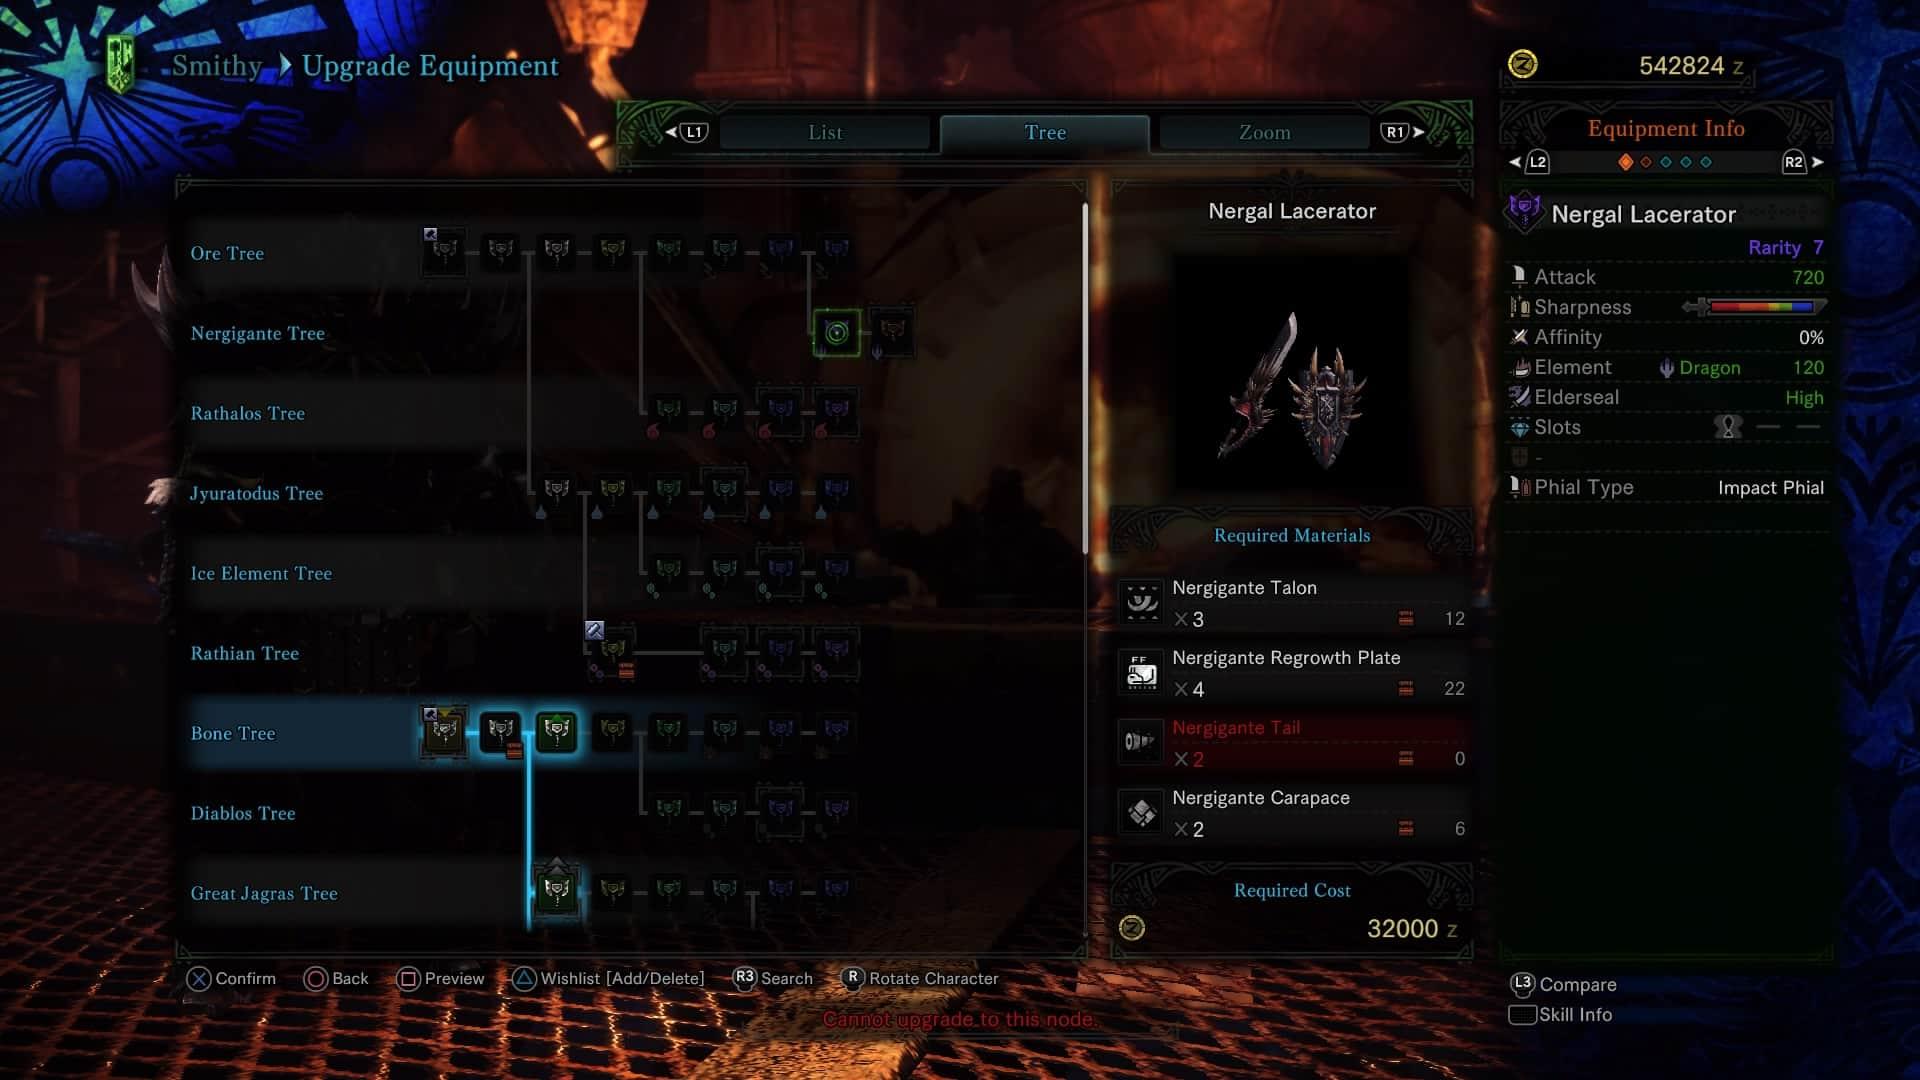 Monster Hunter World Charge Blade - Nergigante Charge Blade